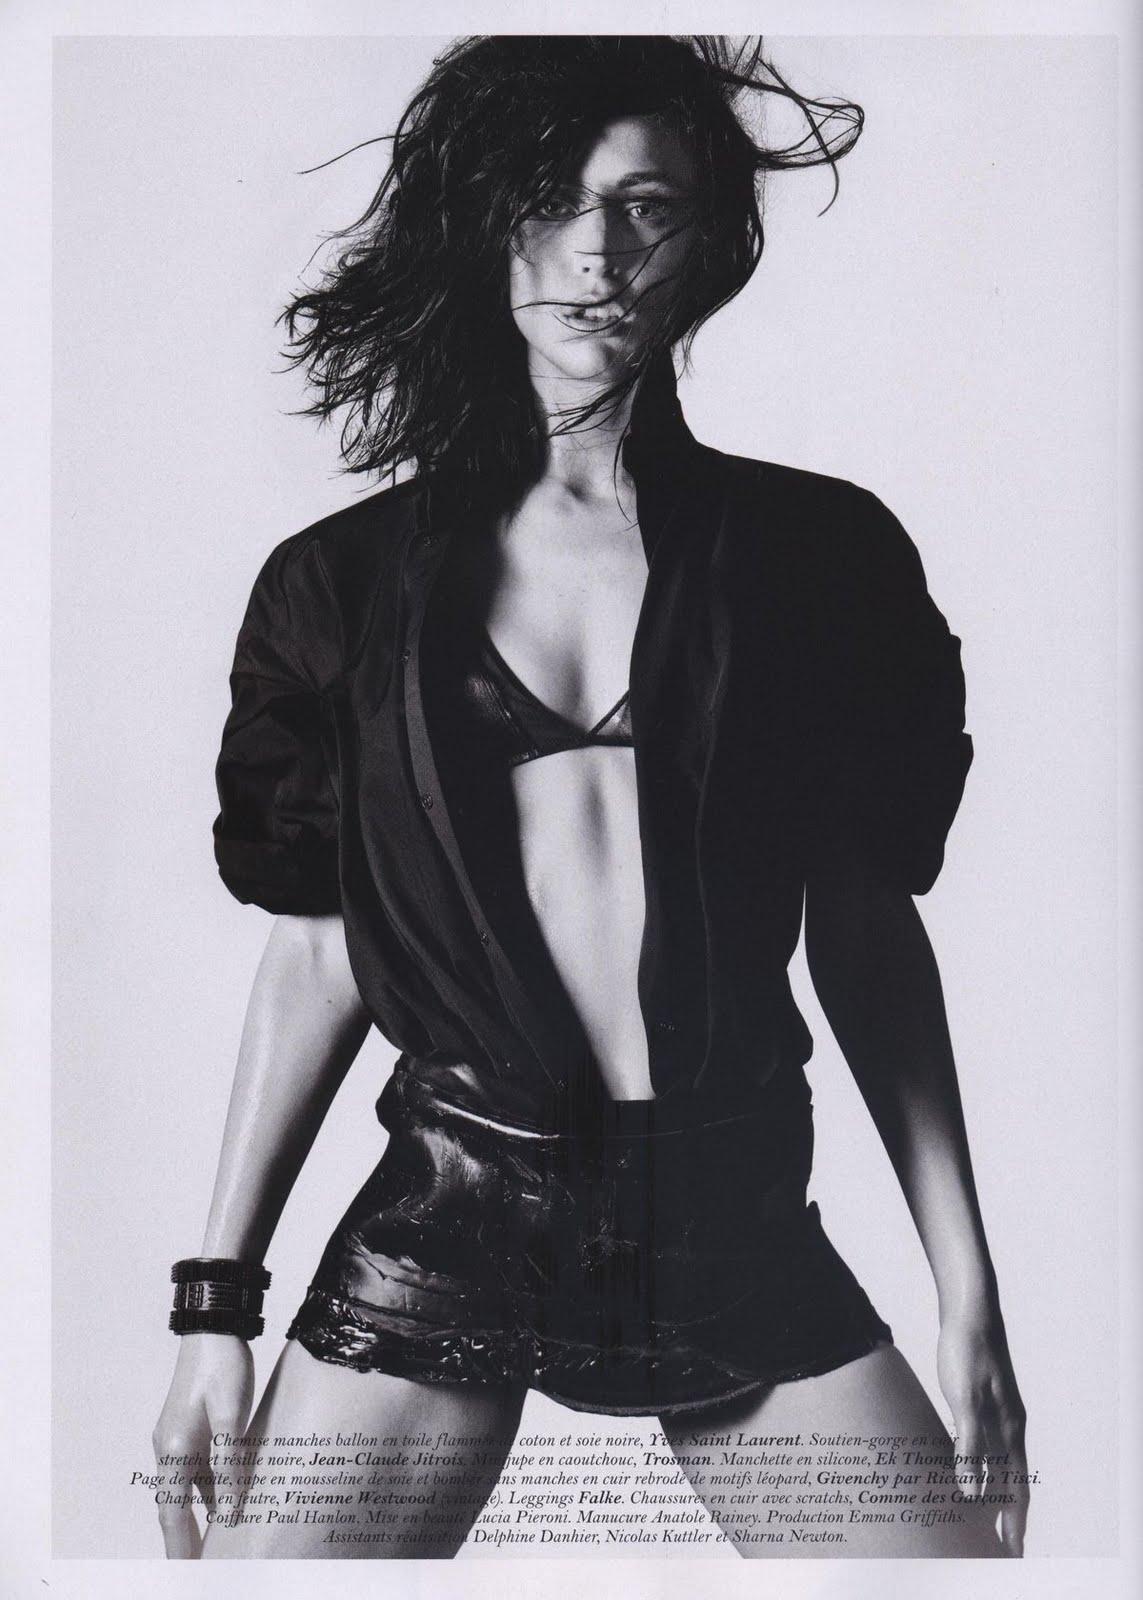 http://2.bp.blogspot.com/-5cIA4PzwWsg/TgNwuIR28AI/AAAAAAAAEao/Z-MgglYFIic/s1600/la+modella+mafia+Raquel+Zimmermann+-+Vogue+Paris%252C+June%253AJuly+2011+by+David+Sims+1.jpg